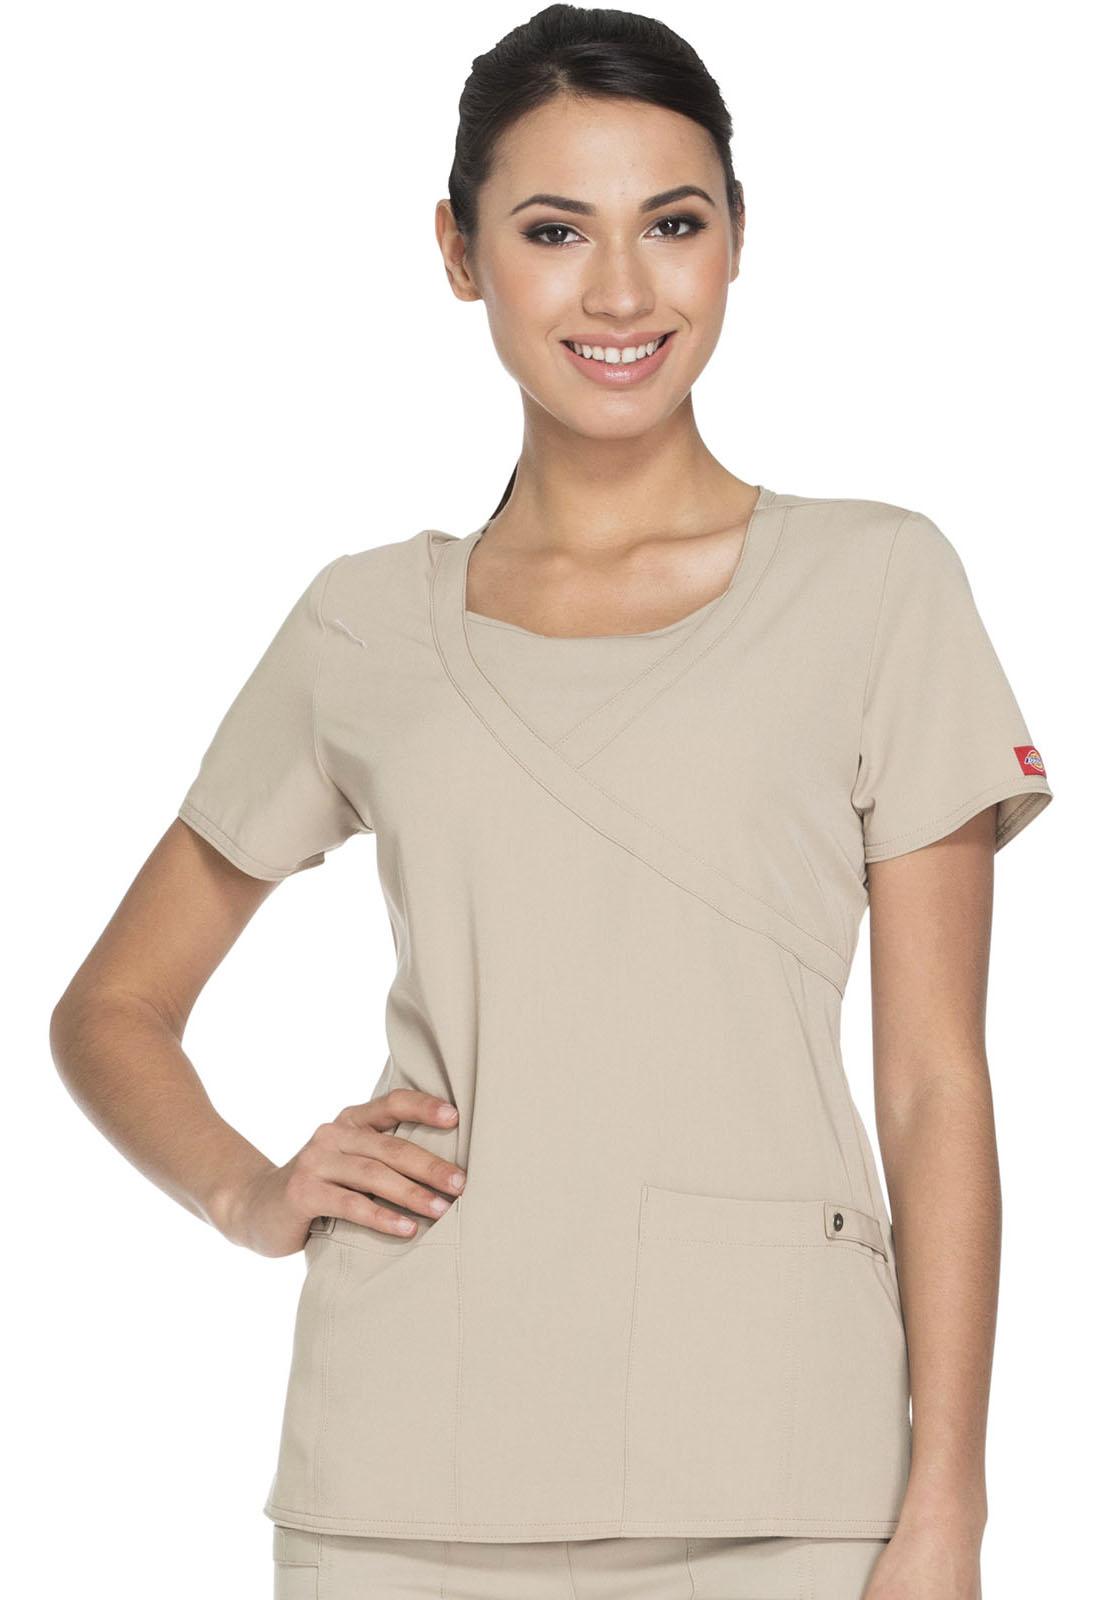 9ffad094691 Dickies Xtreme Stretch Mock Wrap Top 82814-KHIZ from Uniform Works